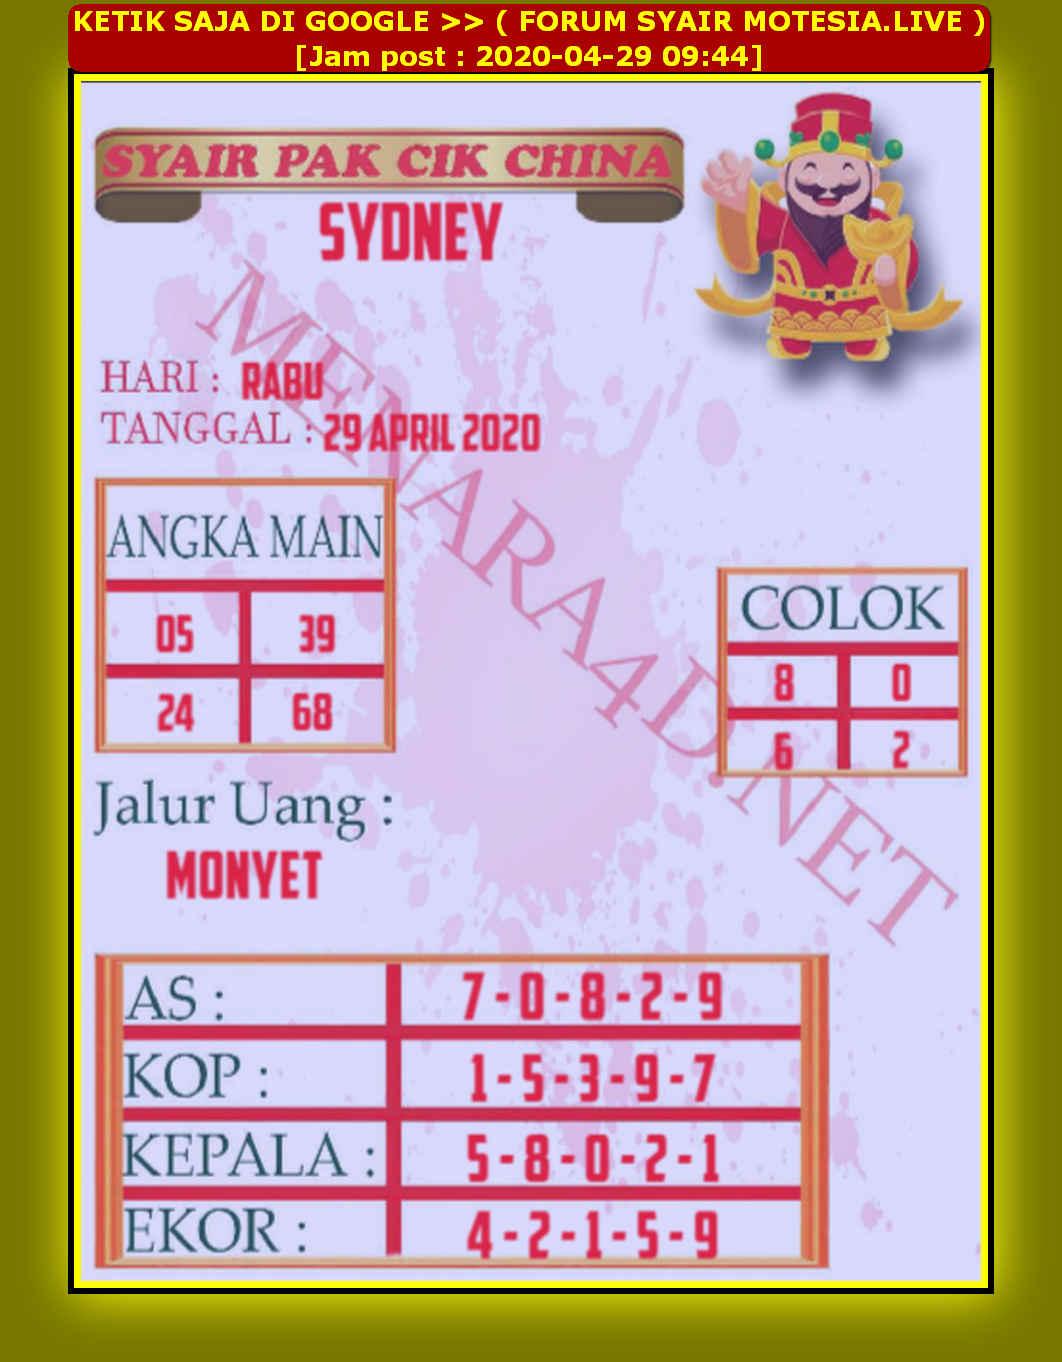 Kode syair Sydney Rabu 29 April 2020 65